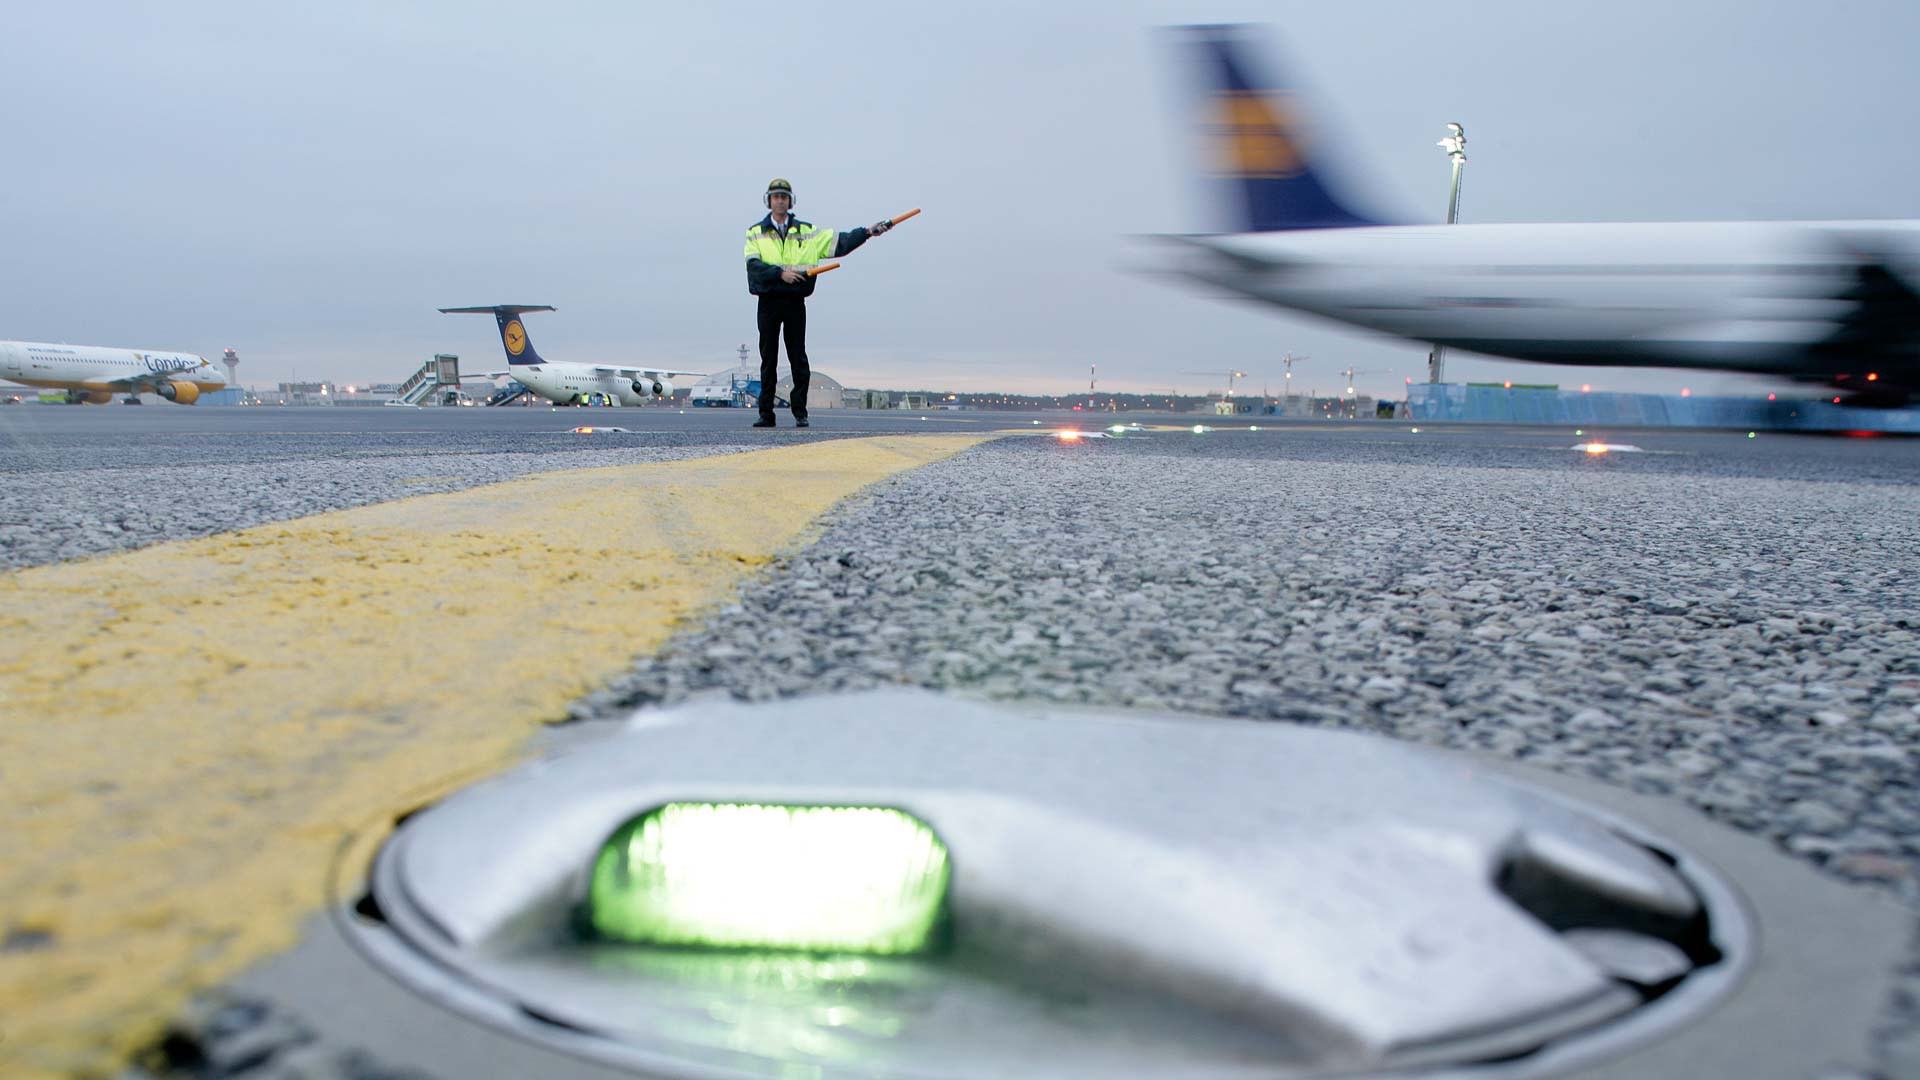 Flughafen Frankfurt M. , Rollfeld Rampe, Marshaller